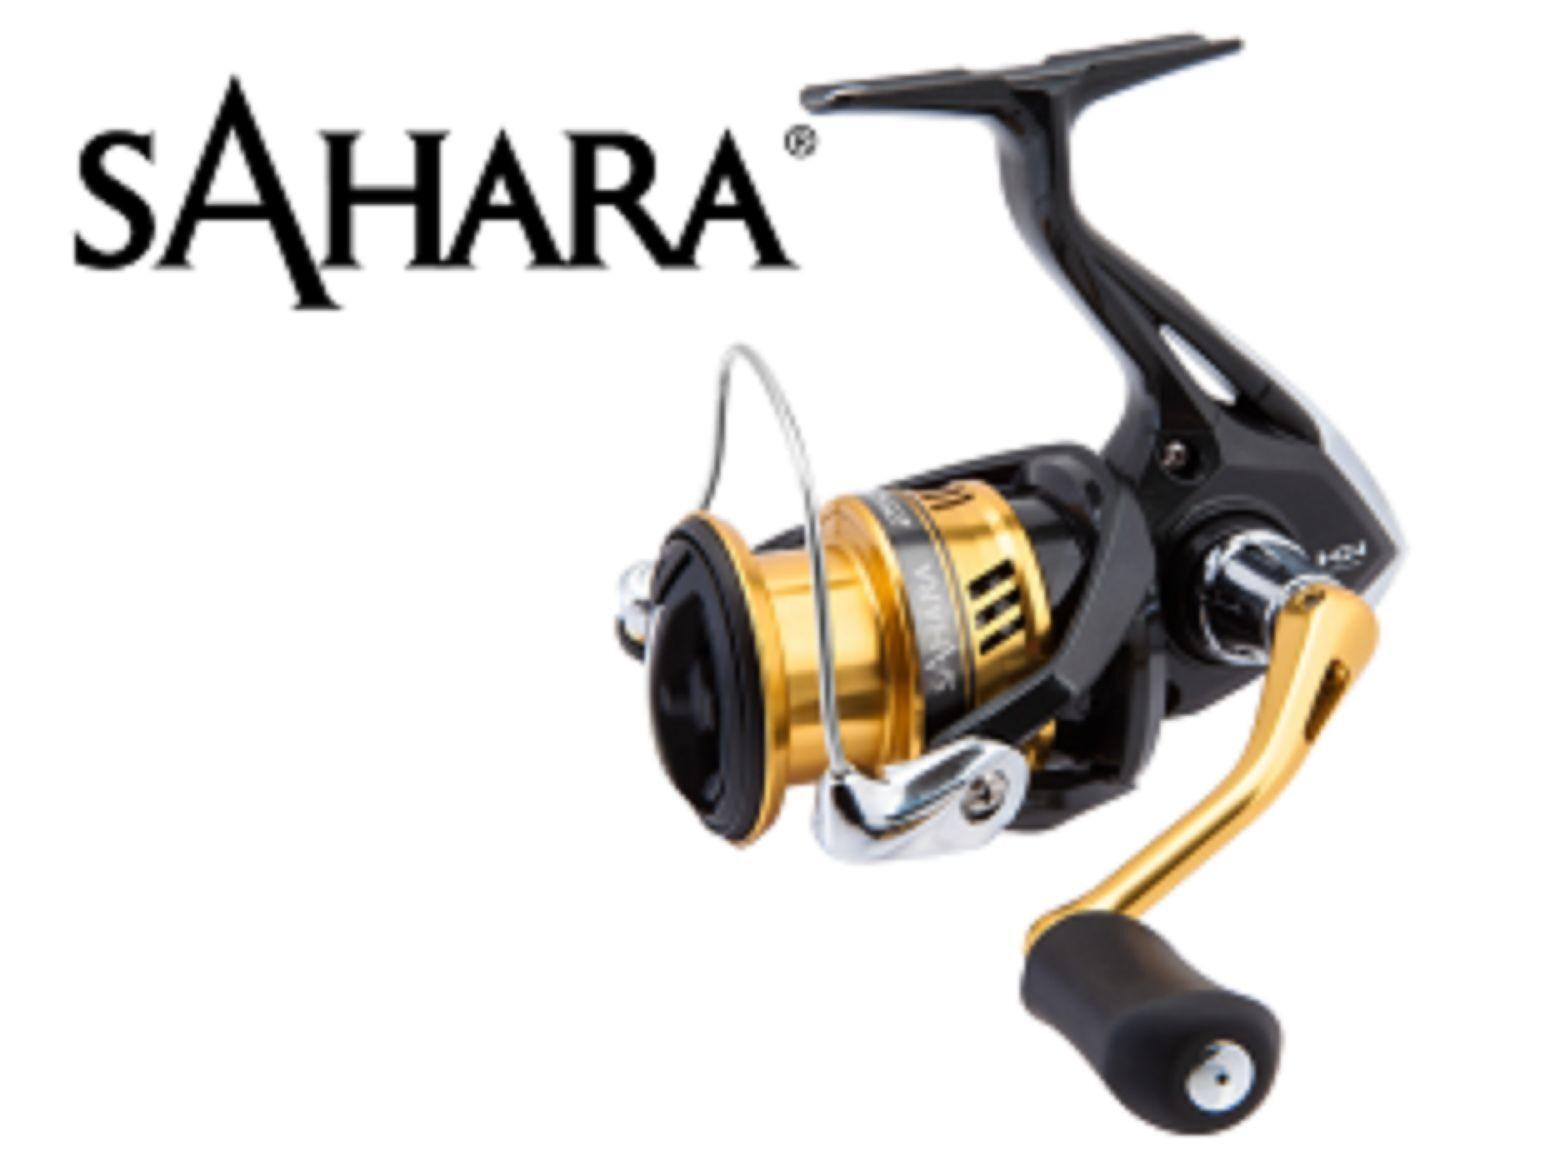 NEW Shimano Sahara Drag, 2500 Spinning Reel, Front Drag, Sahara 4BB + 1RB , 5.0:1 SH2500FI 98a409